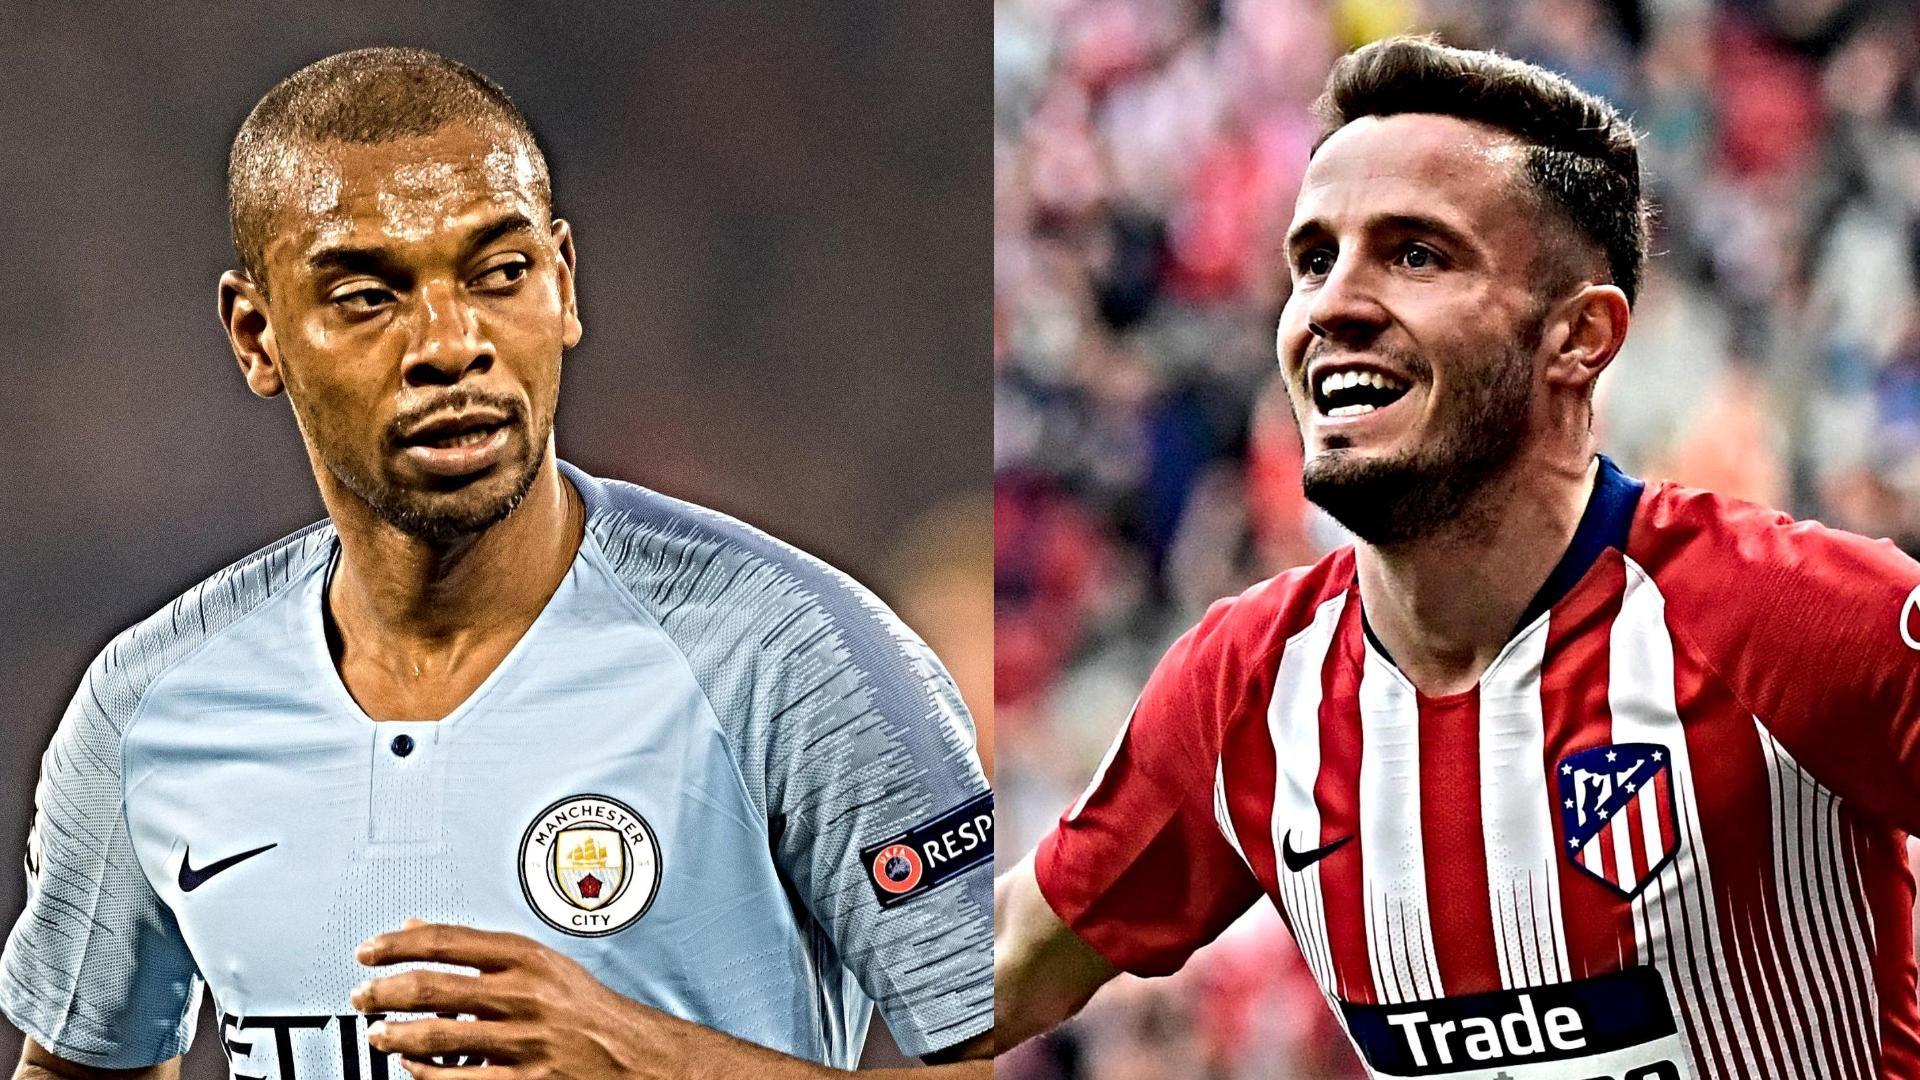 Man City's De Bruyne Stones Fernandinho could return for Fulham clash - sources 3